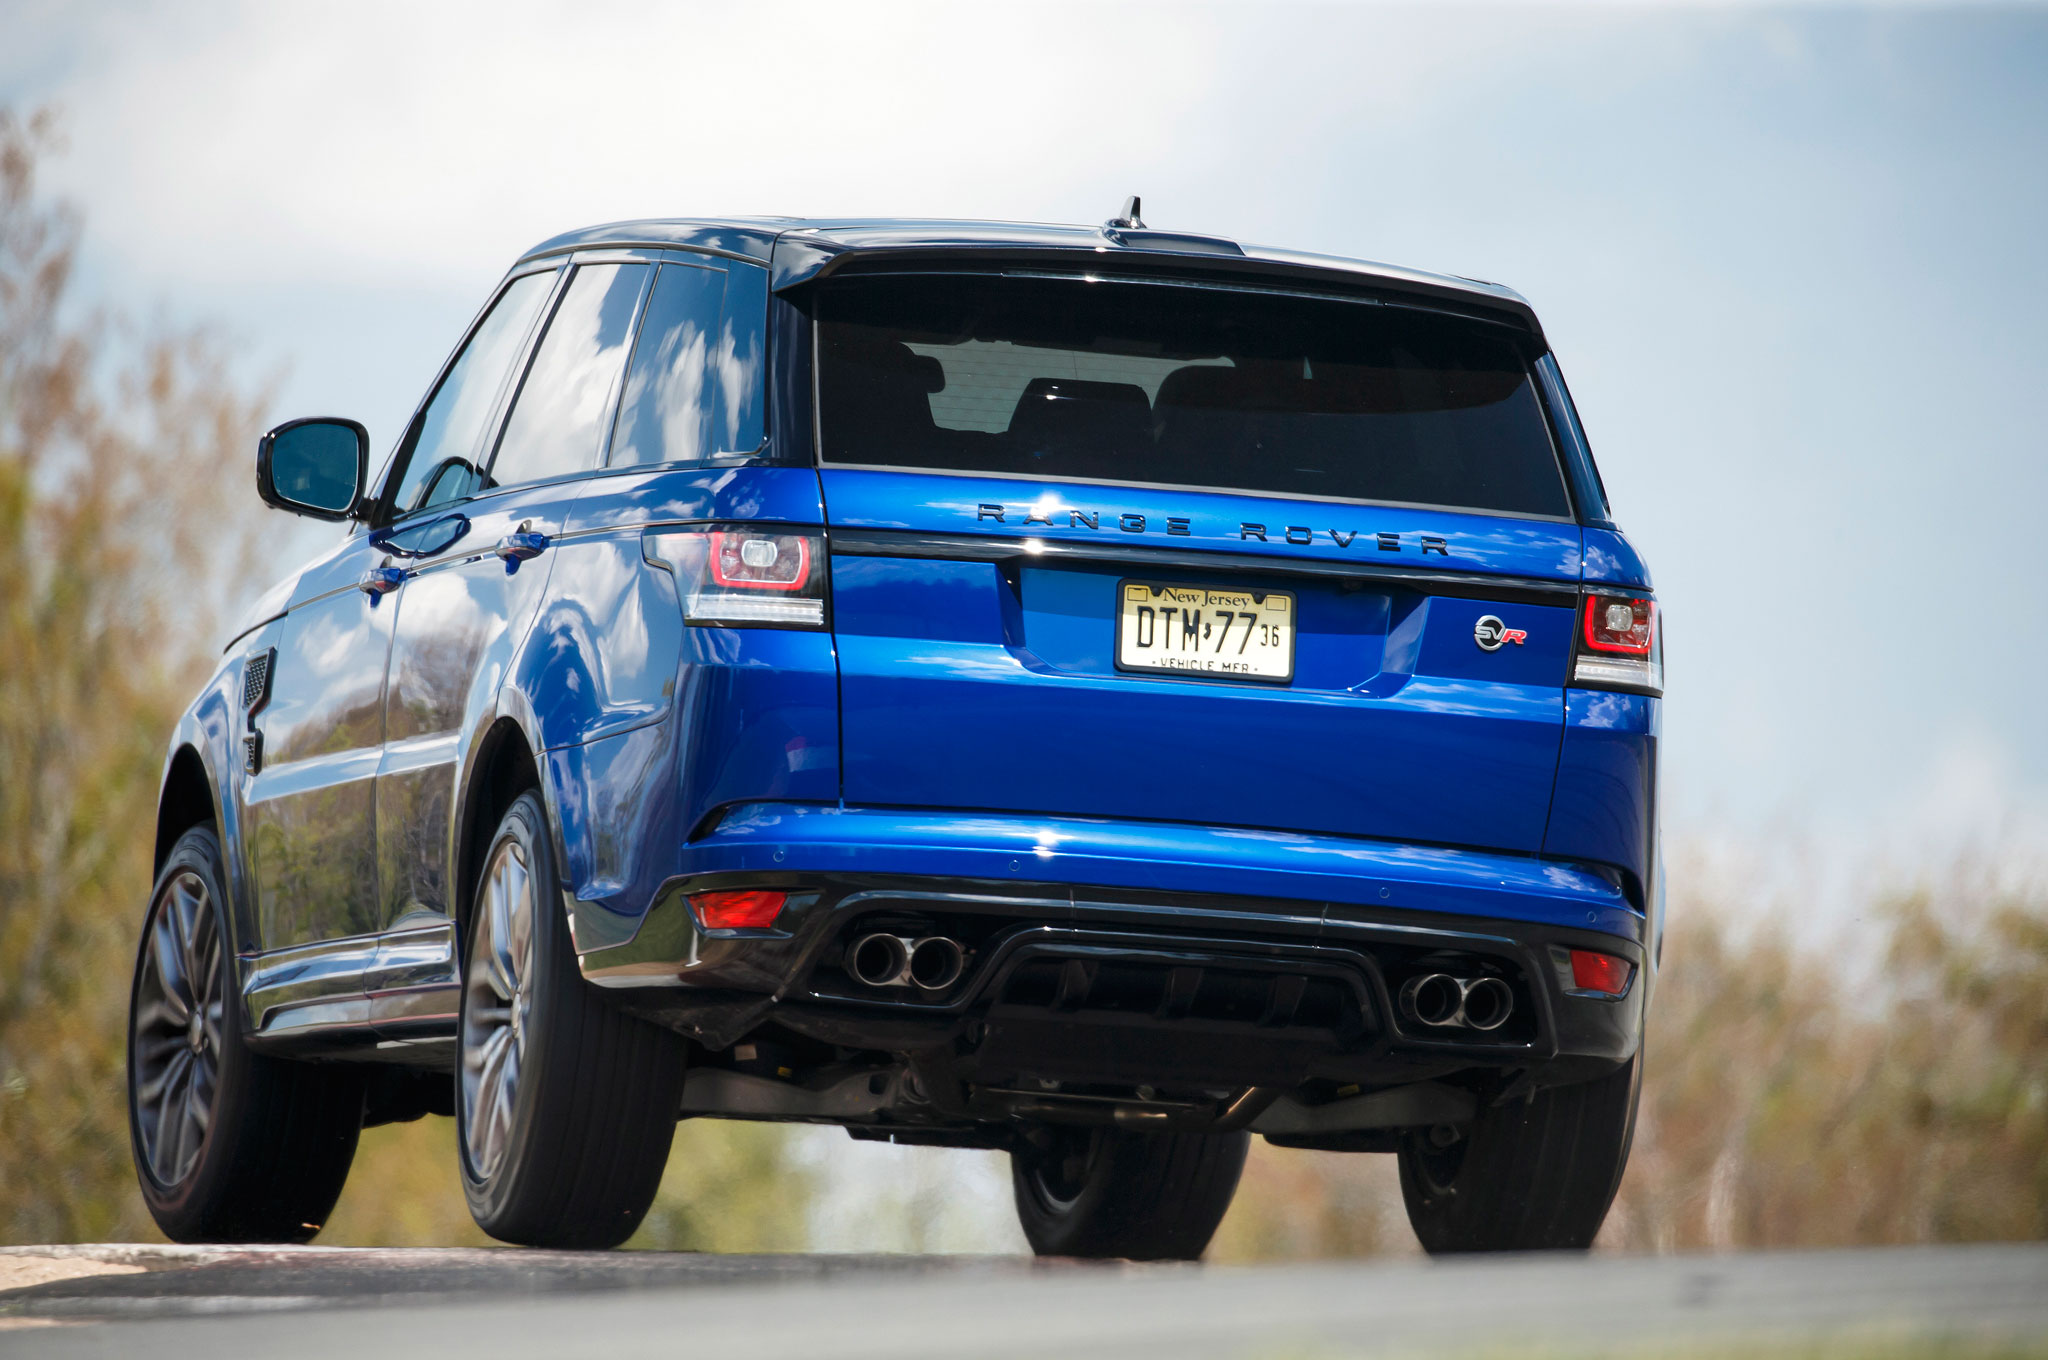 2015 Land Rover Range Sport Svr Review Automobile Magazine P 38 Engine Diagrams Show More